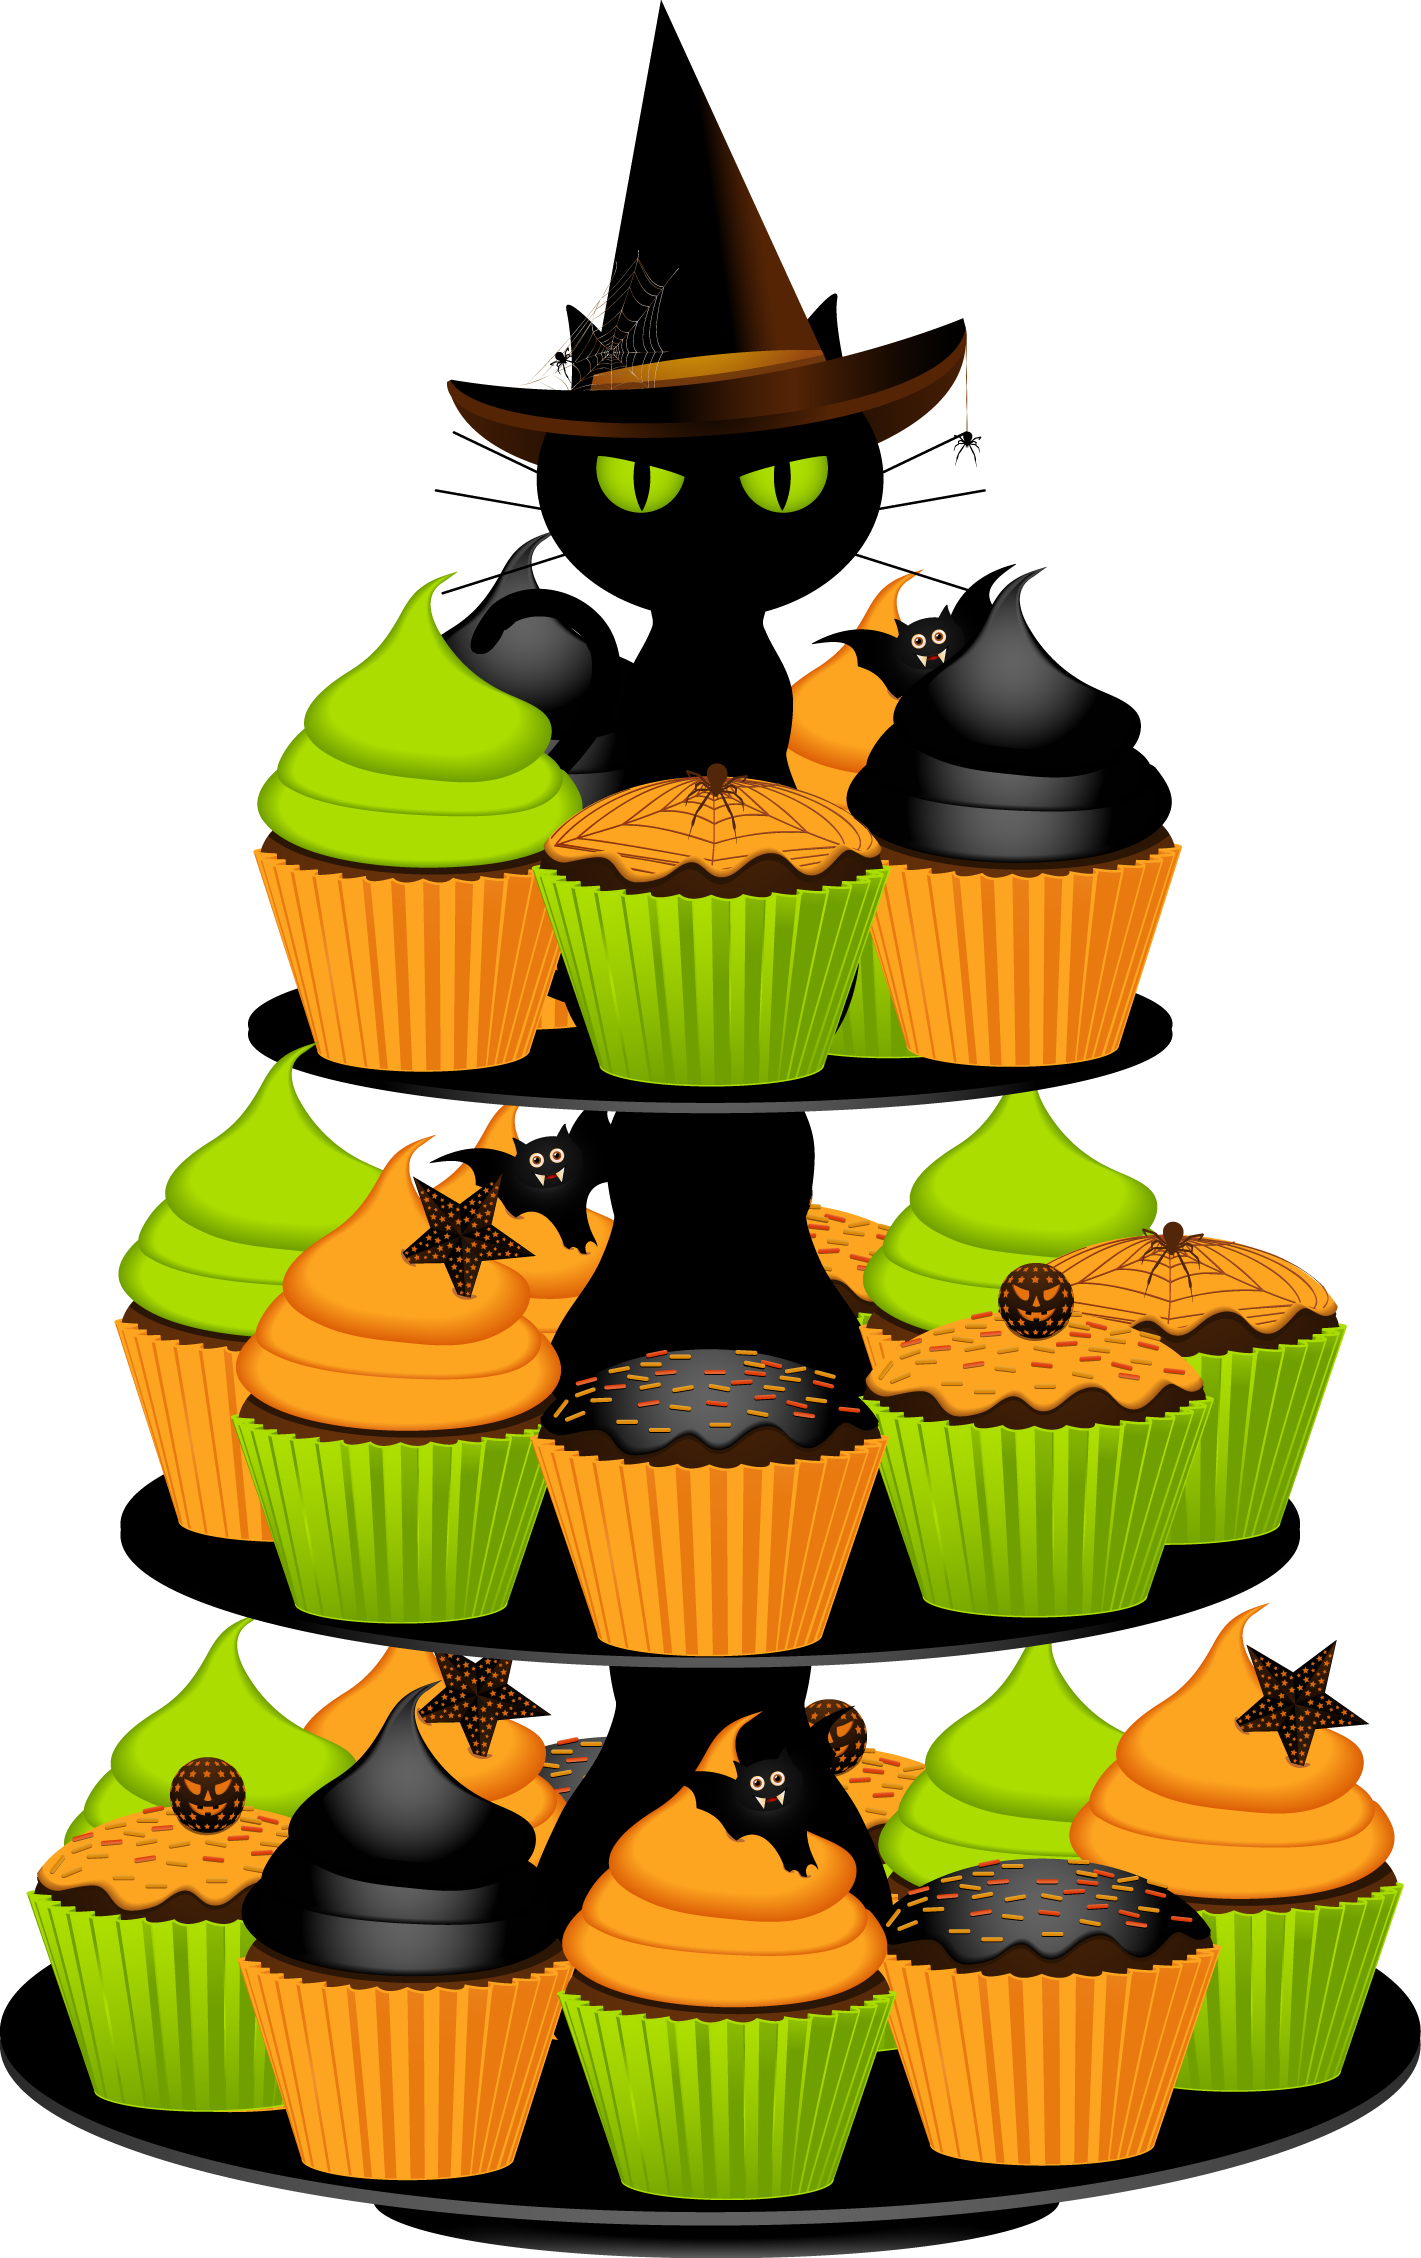 Cake Walk Clipart : Cake Walk Clip Art - Cliparts.co